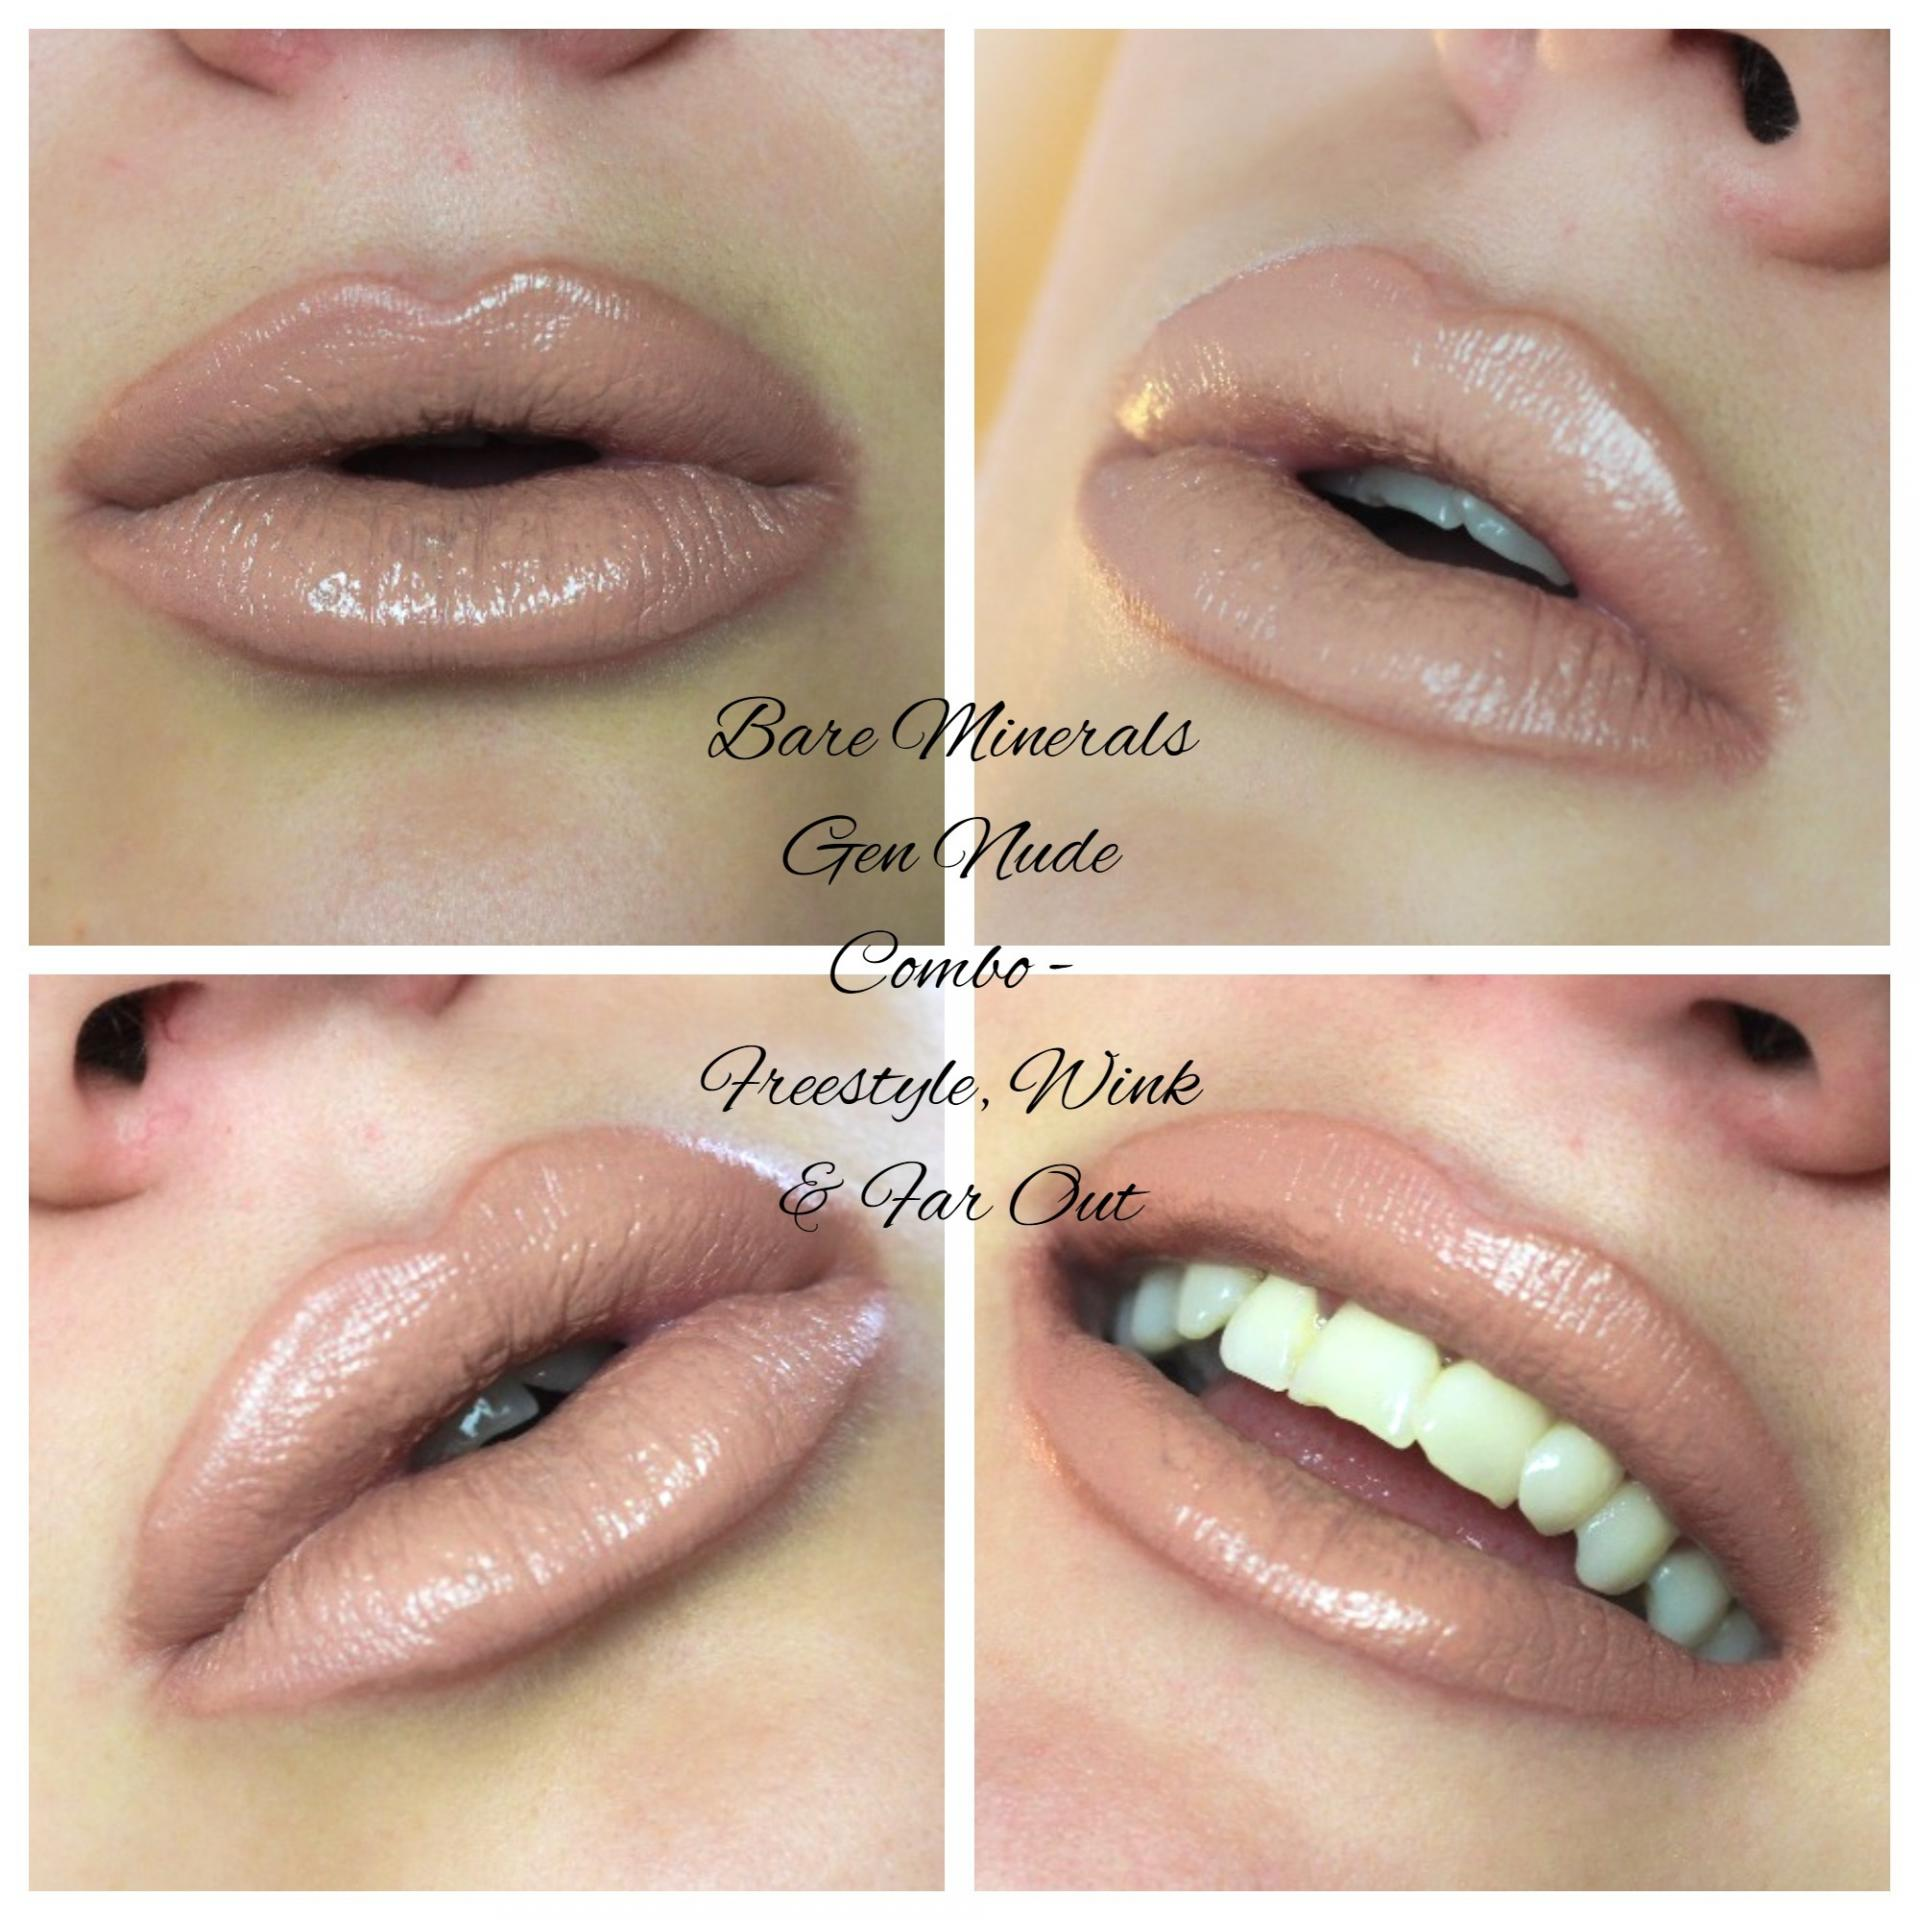 Bare Minerals Gen Nude Buttercream Lipgloss Matte liquid lipcolour